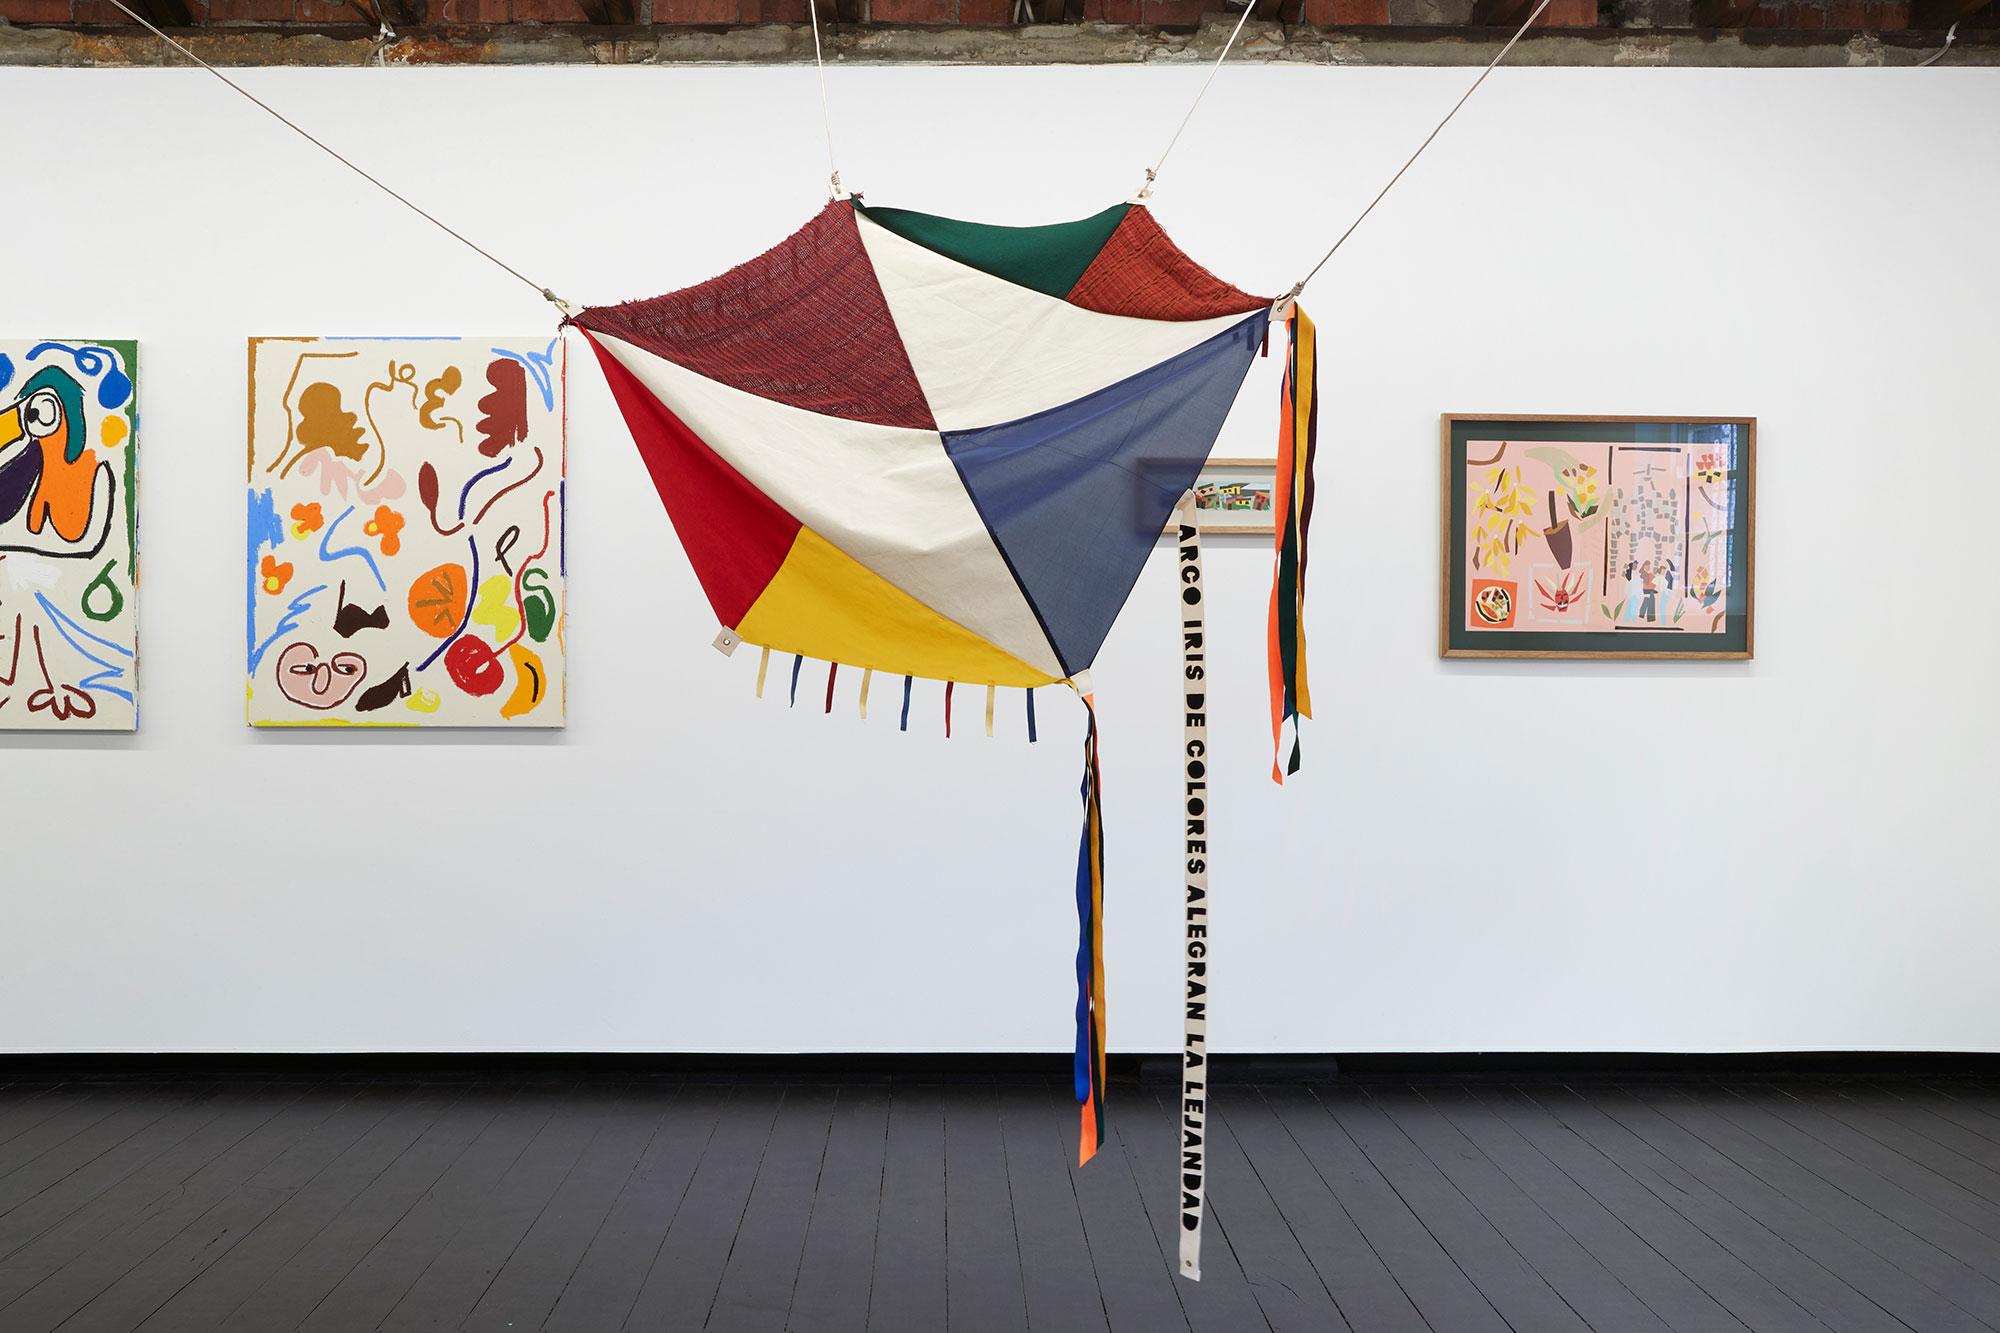 a colourful rainbow kite in an art gallery